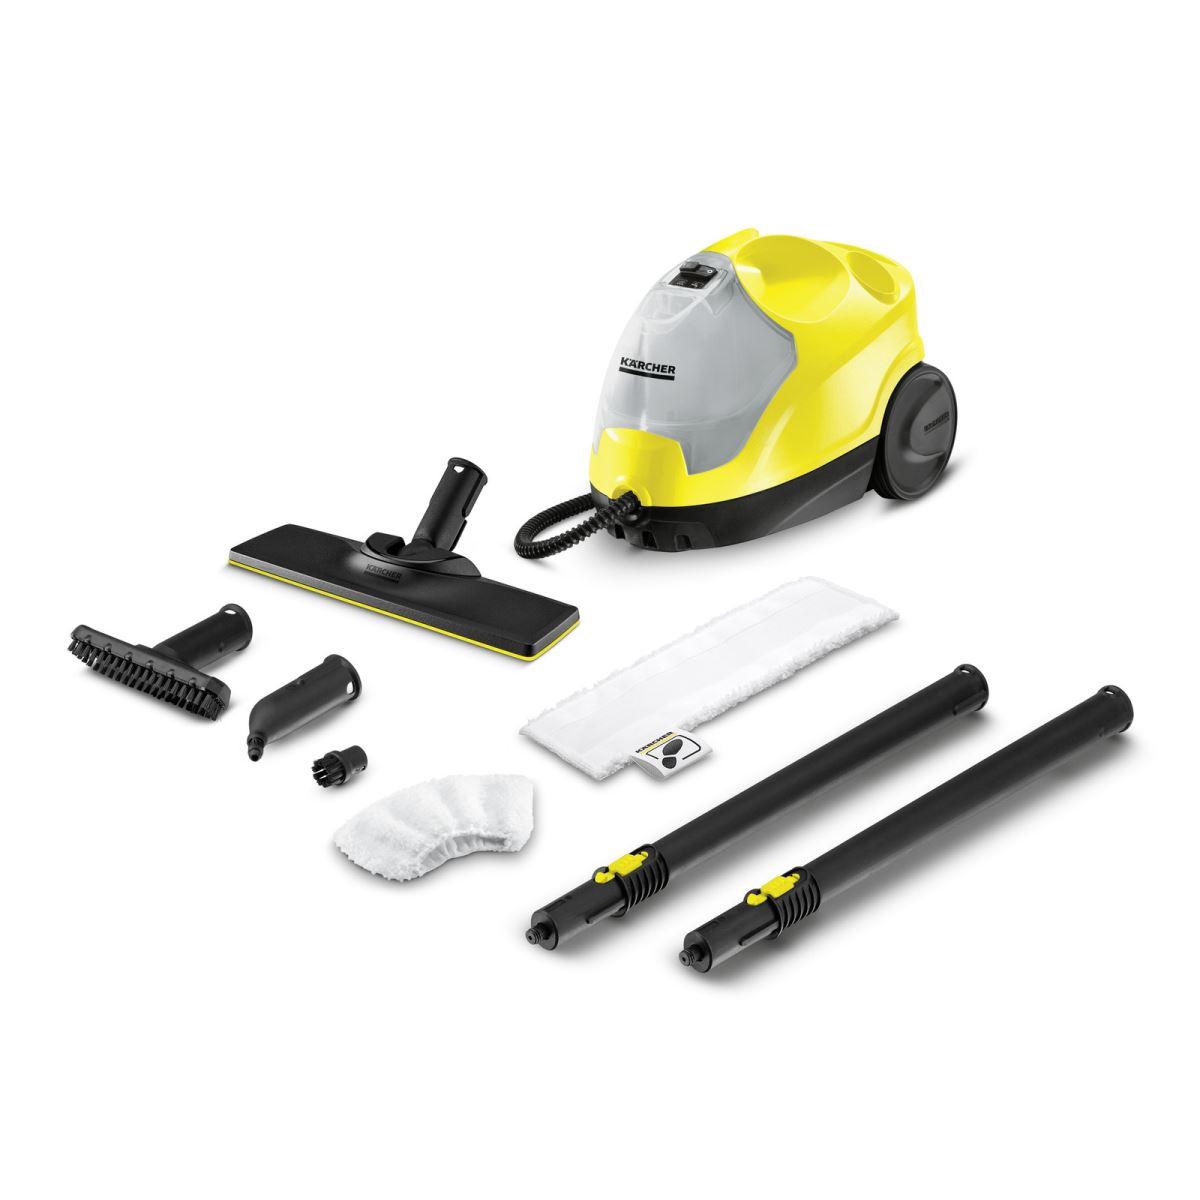 Curățitor cu abur Karcher SC 4 Yellow *EU 15124500